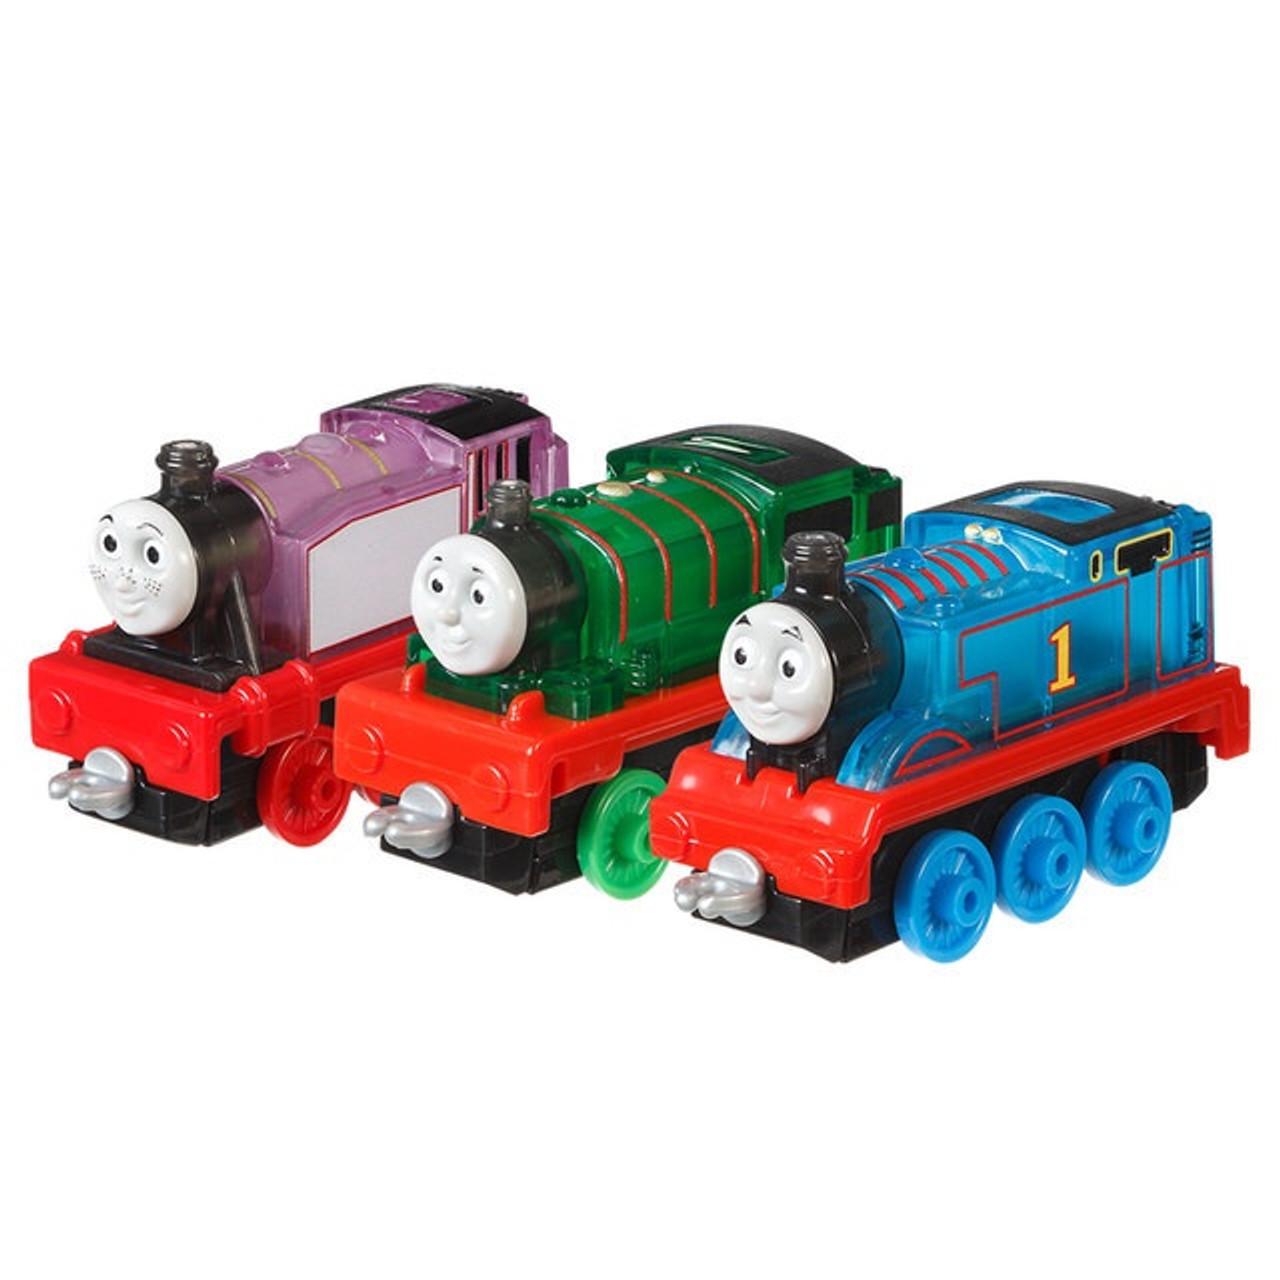 THOMAS & FRIENDS LIGHT UP RACER